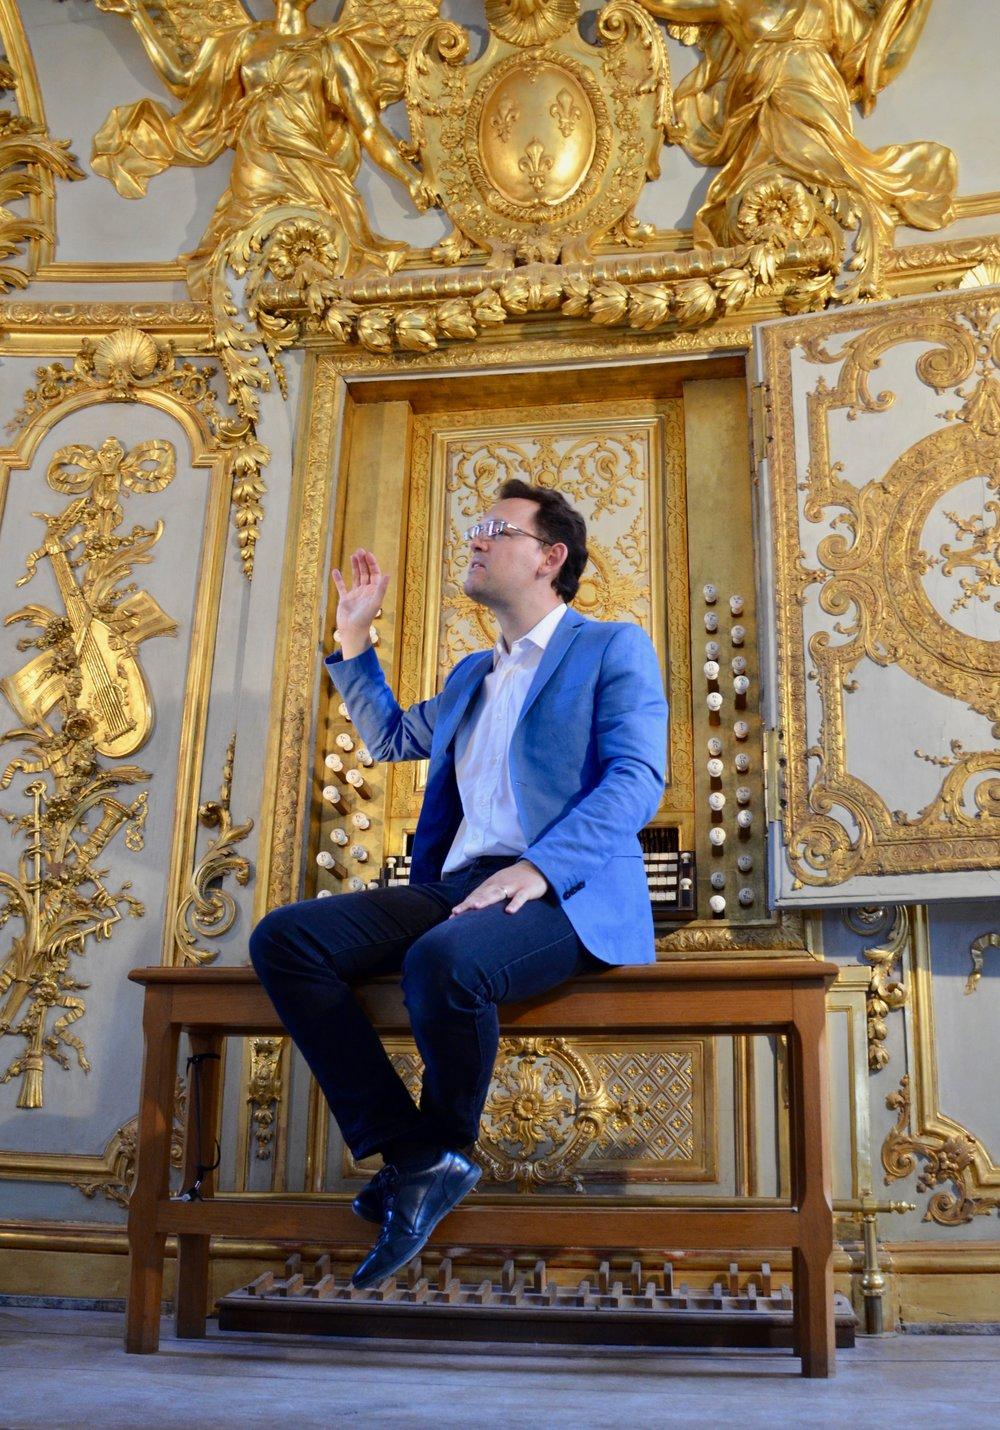 Jean-Baptiste speaks about La Chapelle Royale 0rgan